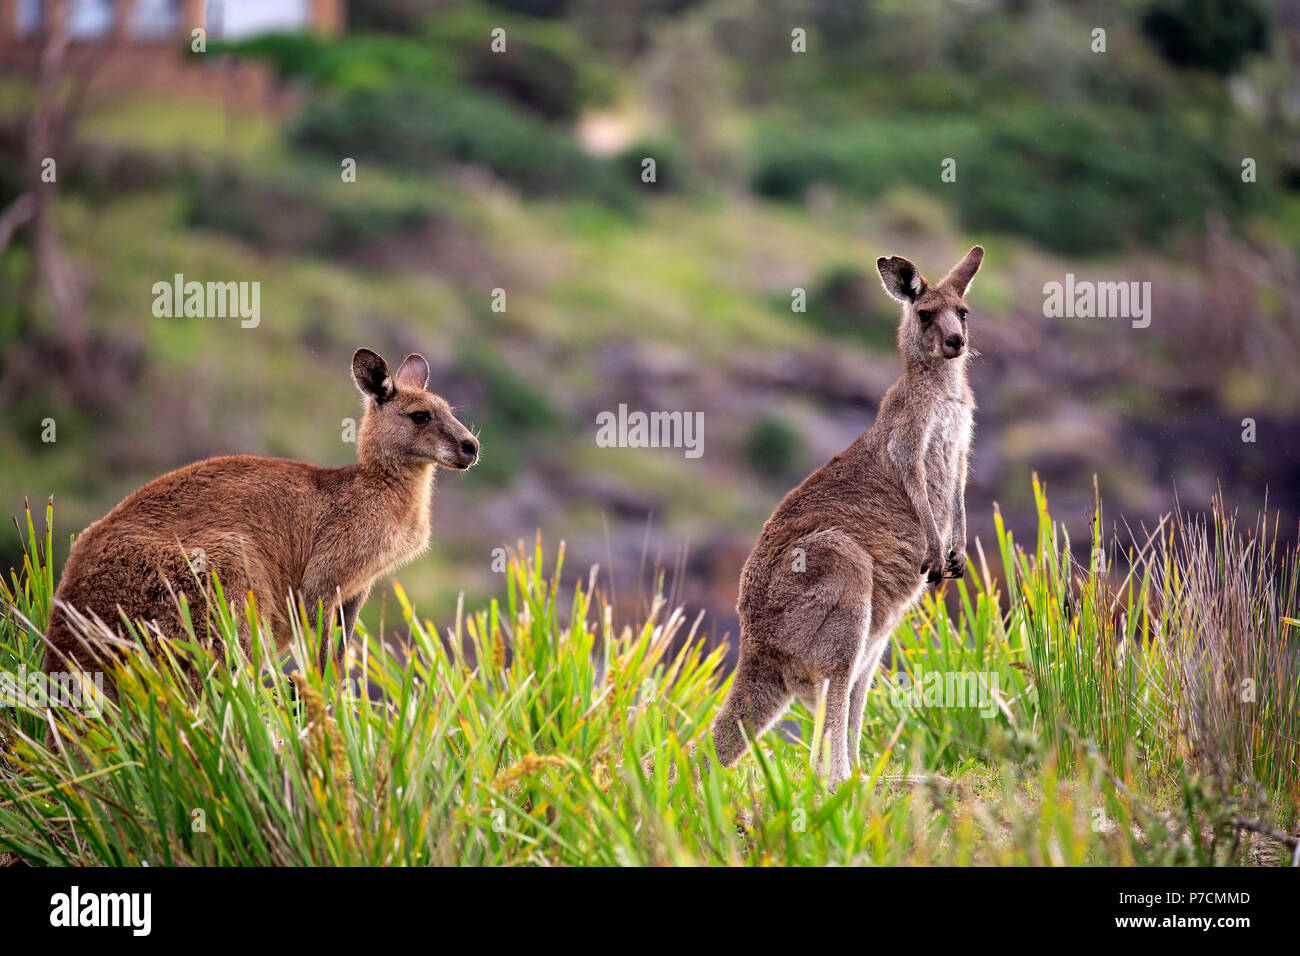 Canguro gris oriental, Feliz Playa, Parque Nacional Murramarang, New South Wales, Australia (Macropus giganteus) Imagen De Stock